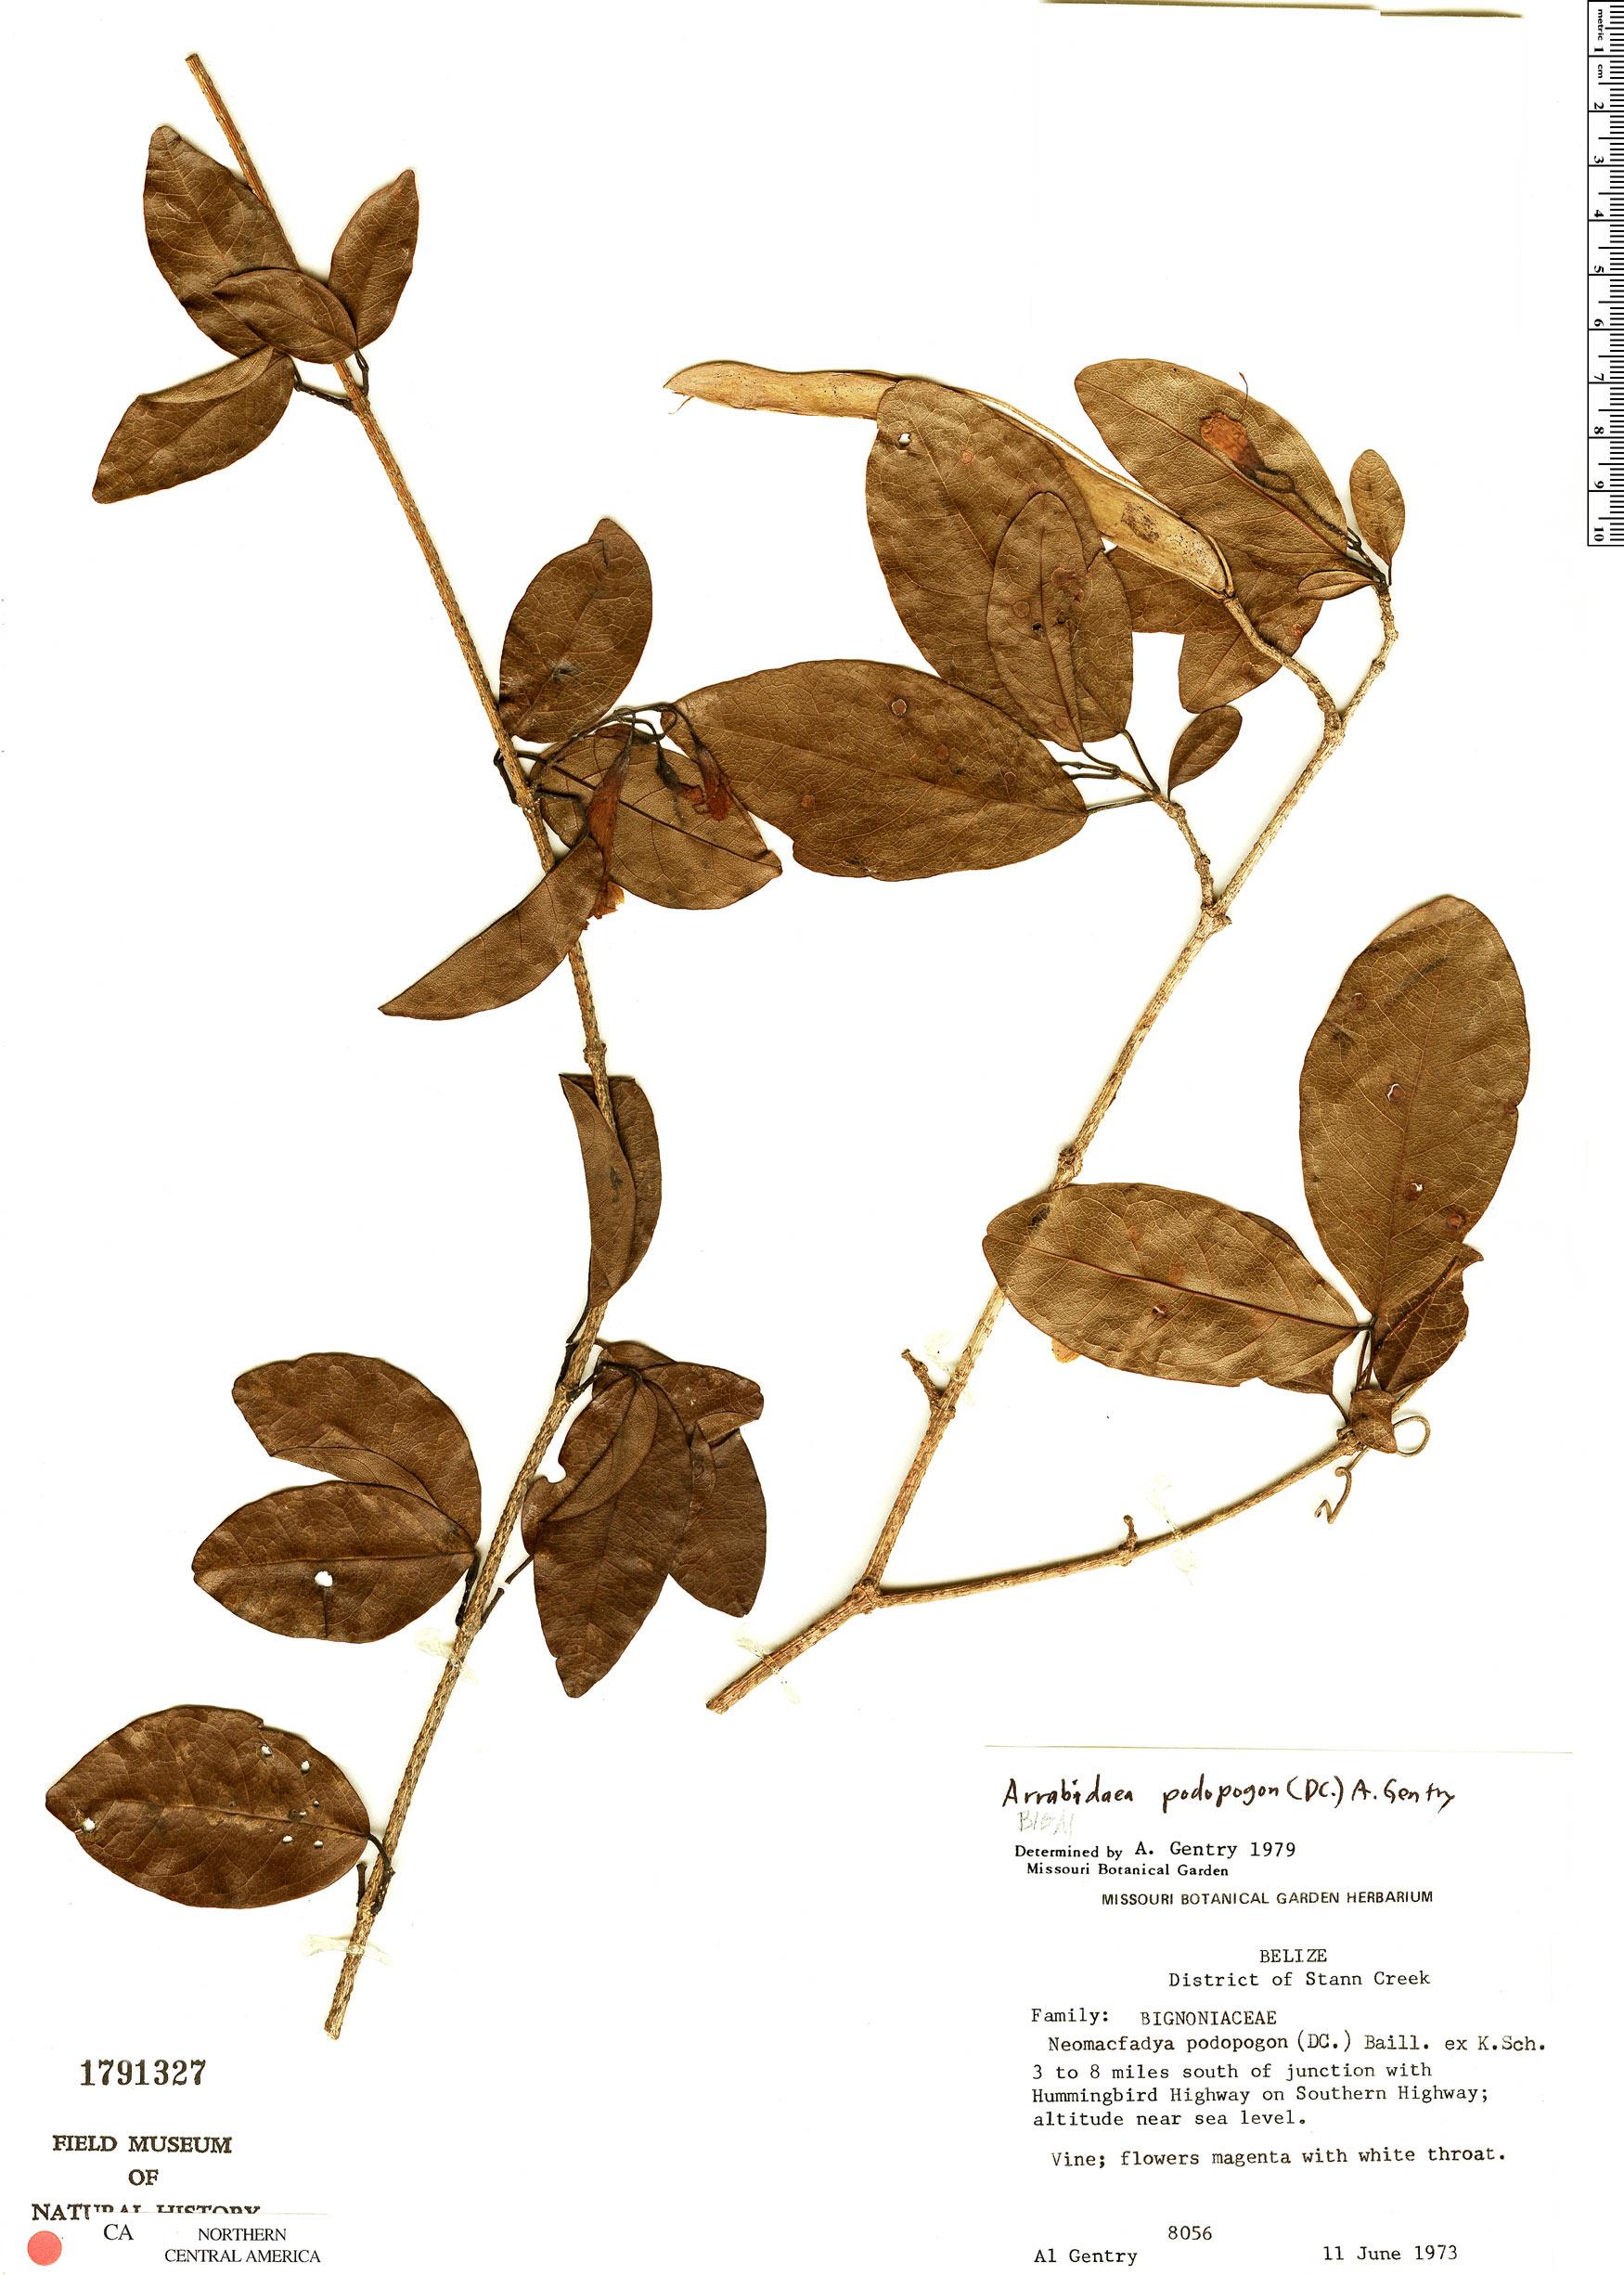 Specimen: Fridericia podopogon